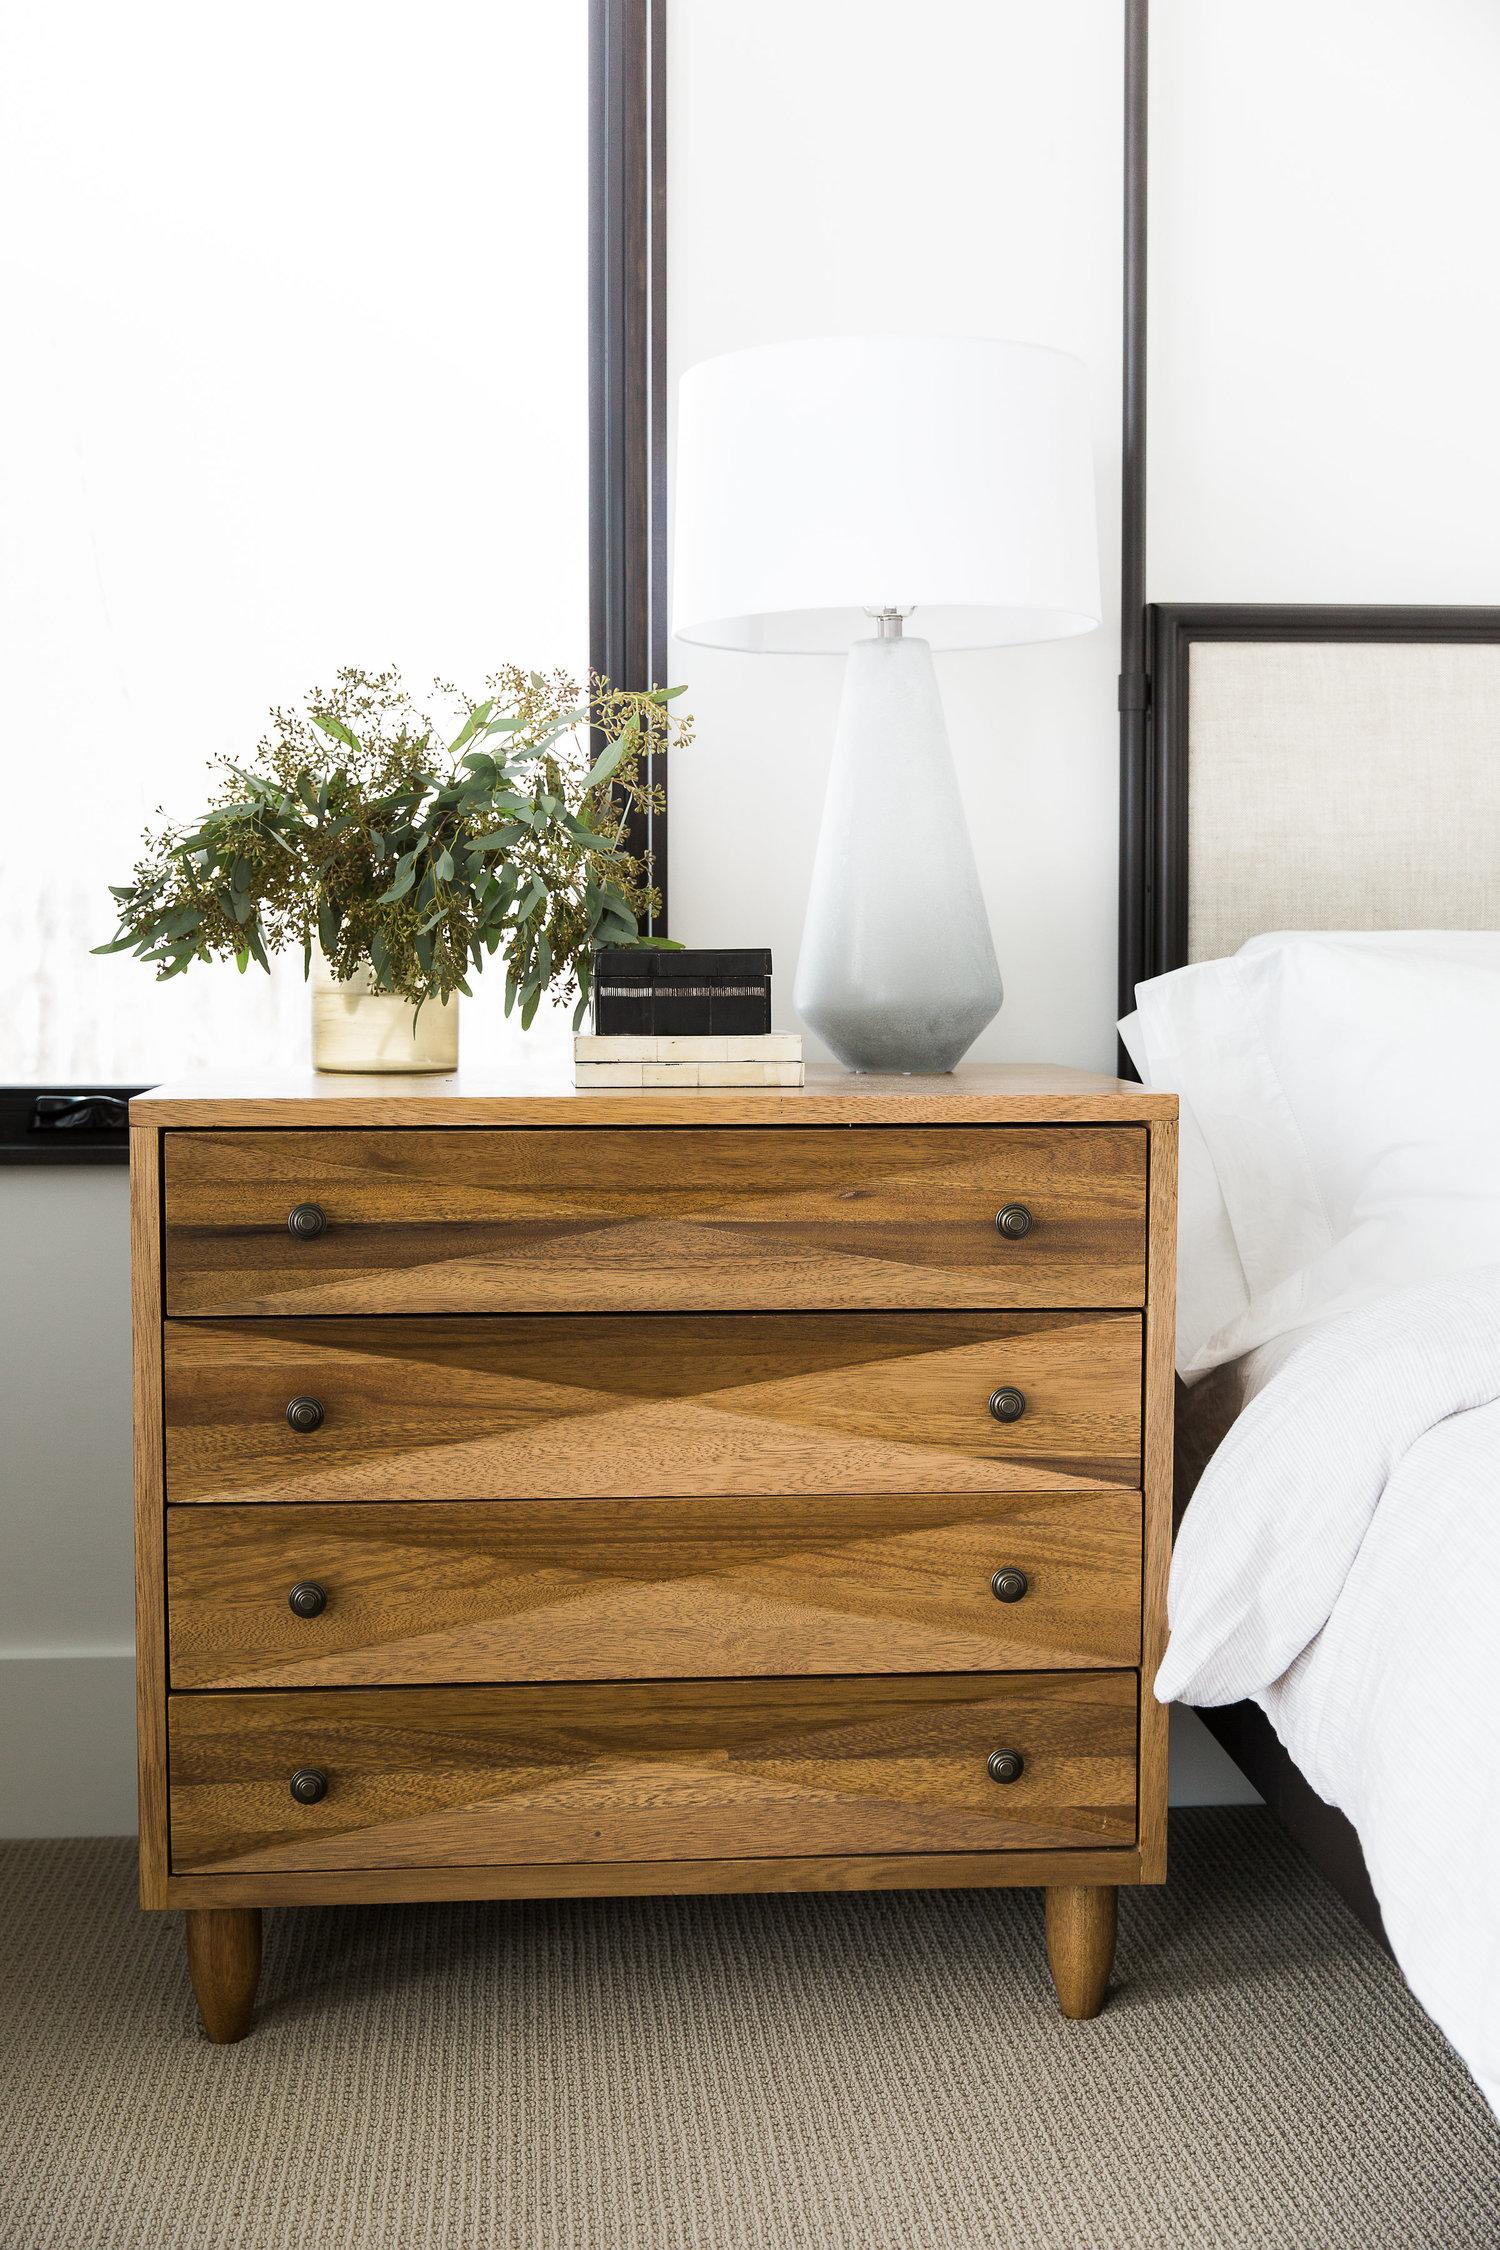 Details on wooden nightstand